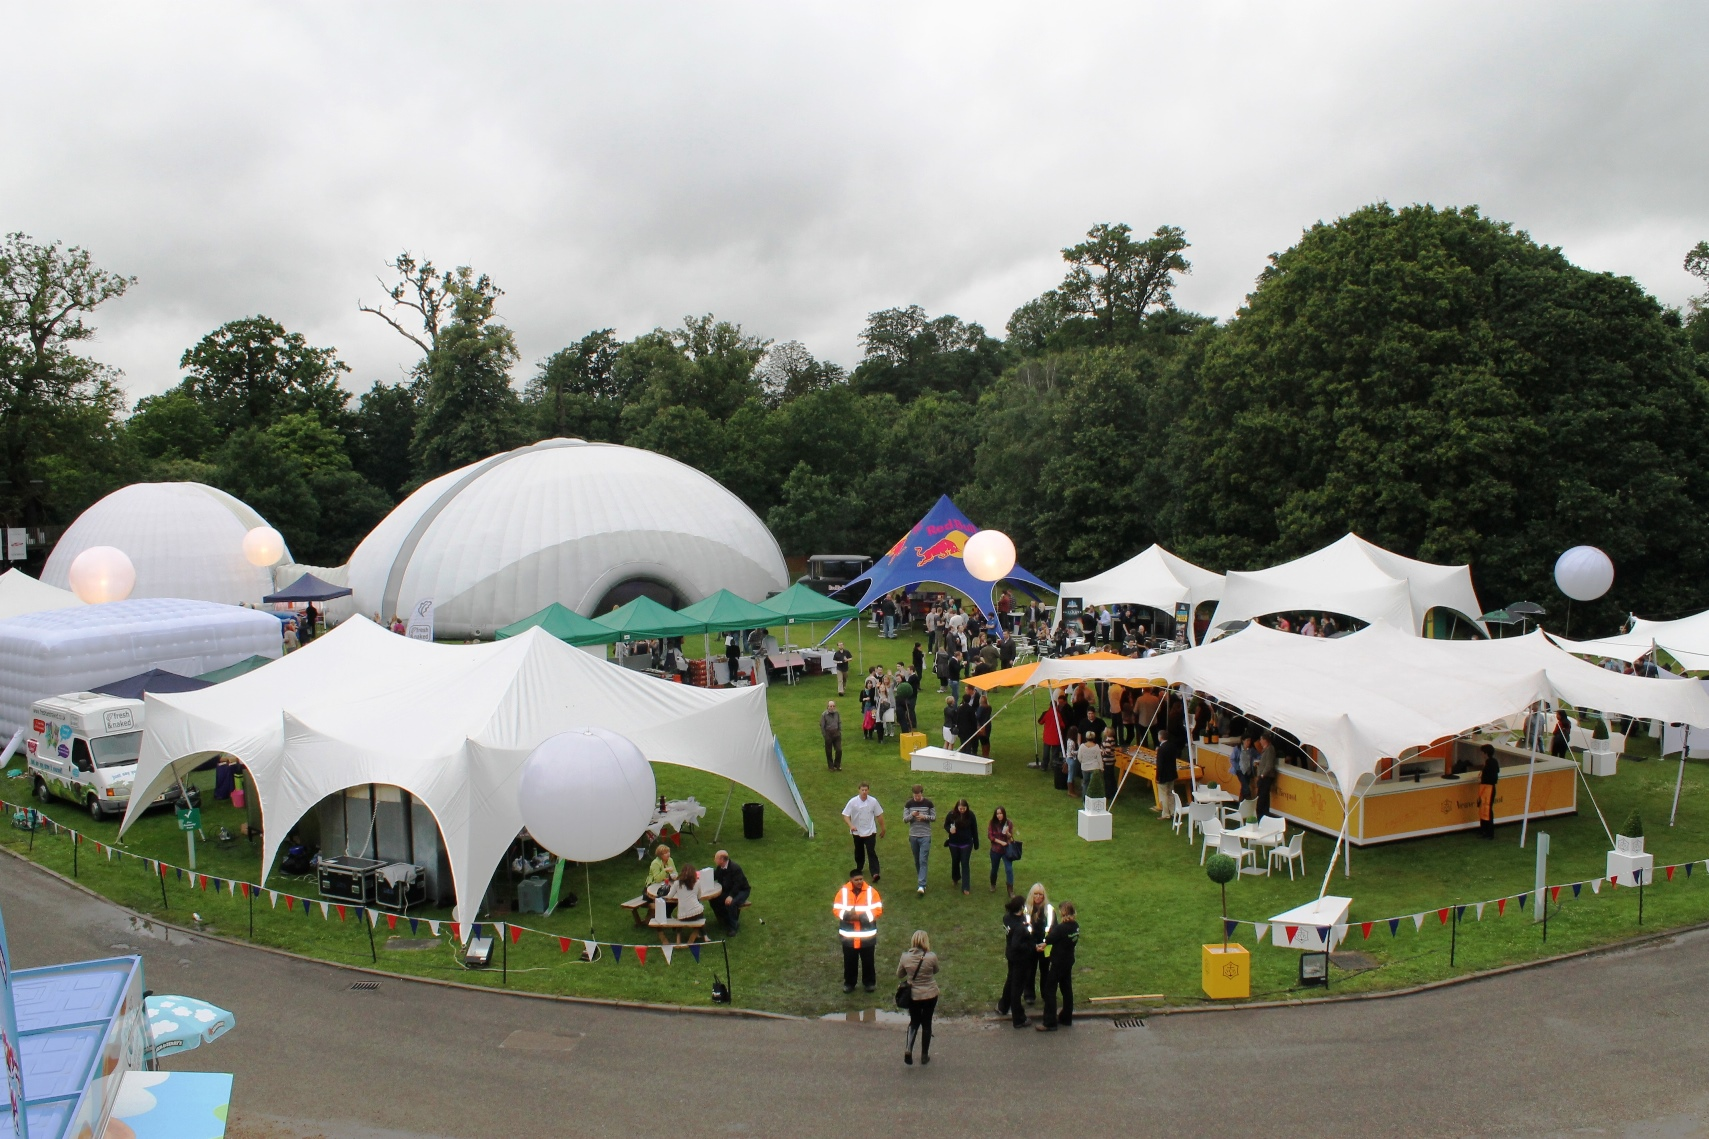 Reward Staff With A Company Festival – A Great Way To Celebrate Achievements